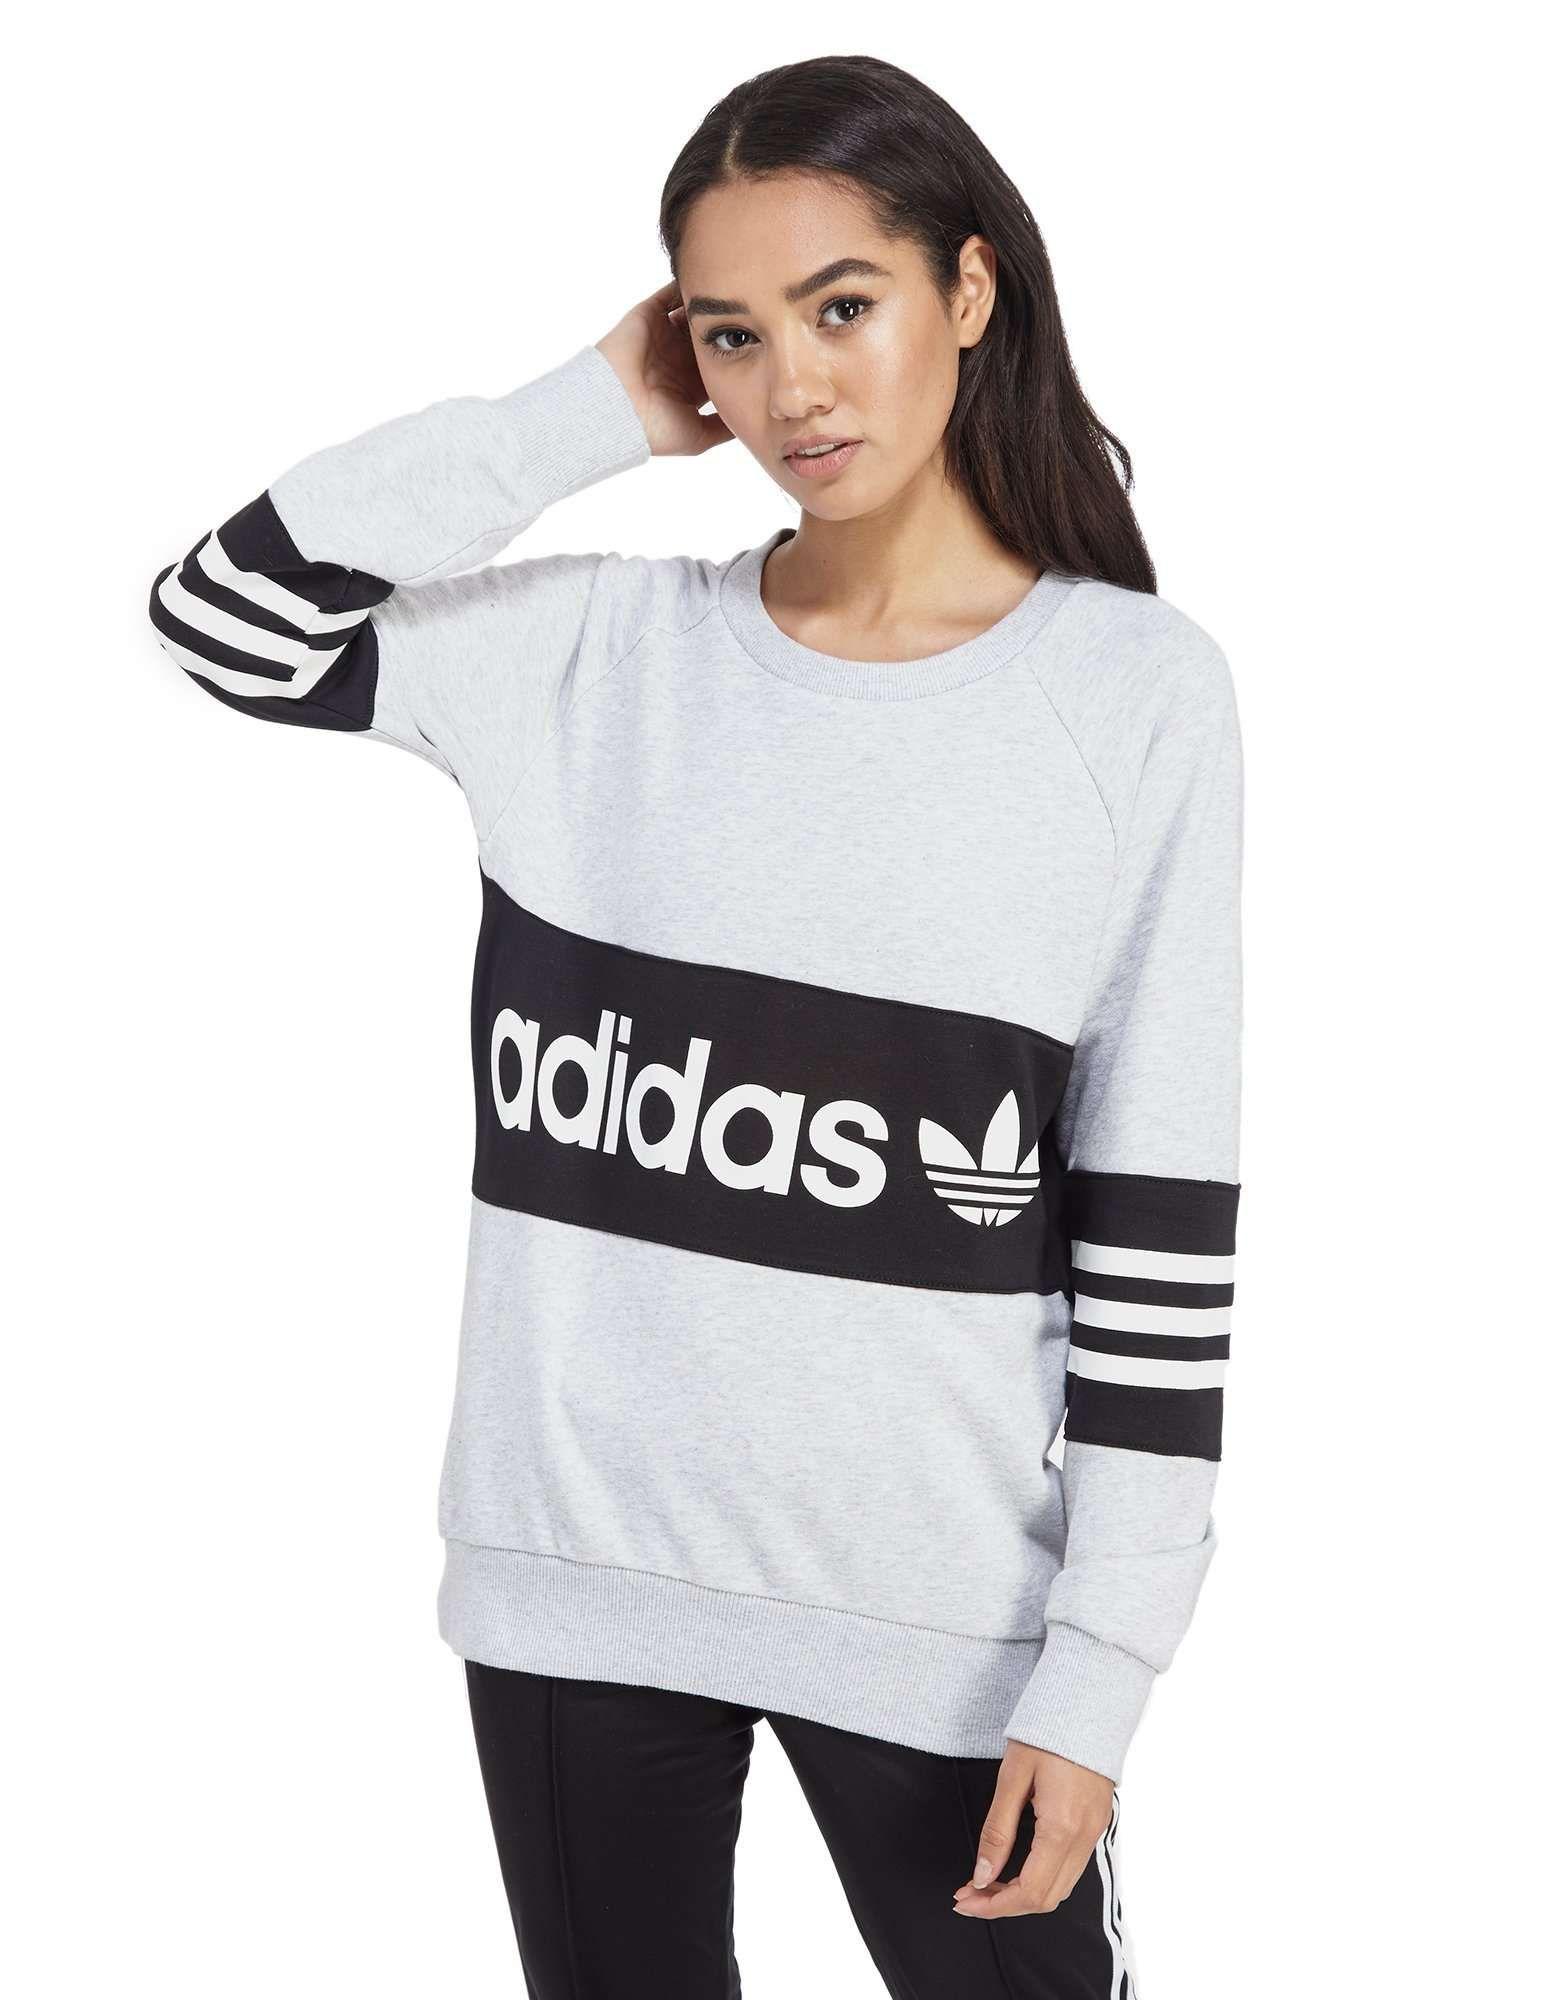 adidas Originals Street Crew Sweatshirt - Shop online for adidas Originals  Street Crew Sweatshirt with JD